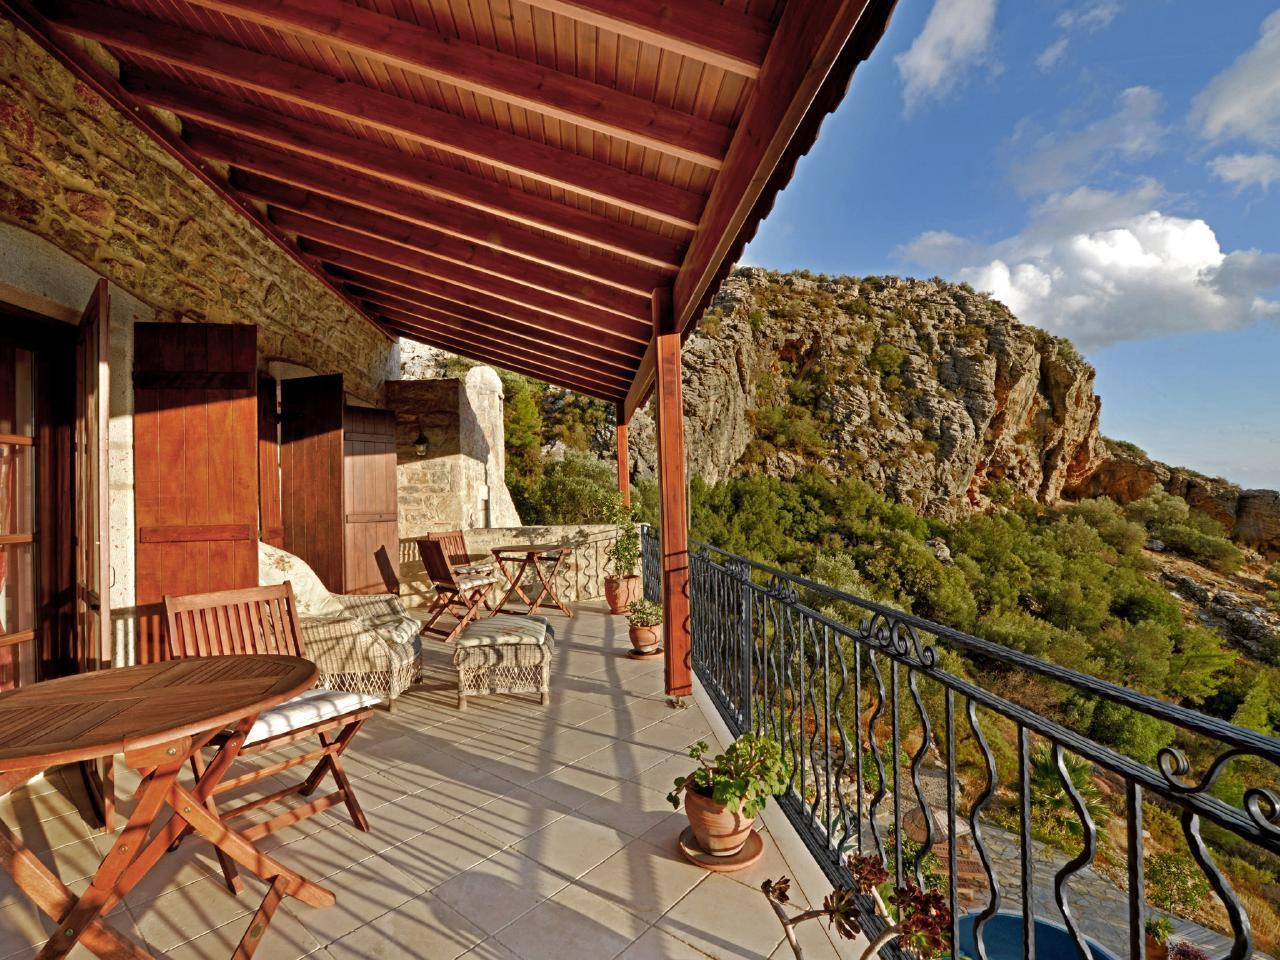 Maison de vacances Exklusives Chalet, romantisch am Berghang und Meer gelegen (2506674), Mesudiye, , Région Egéenne, Turquie, image 5